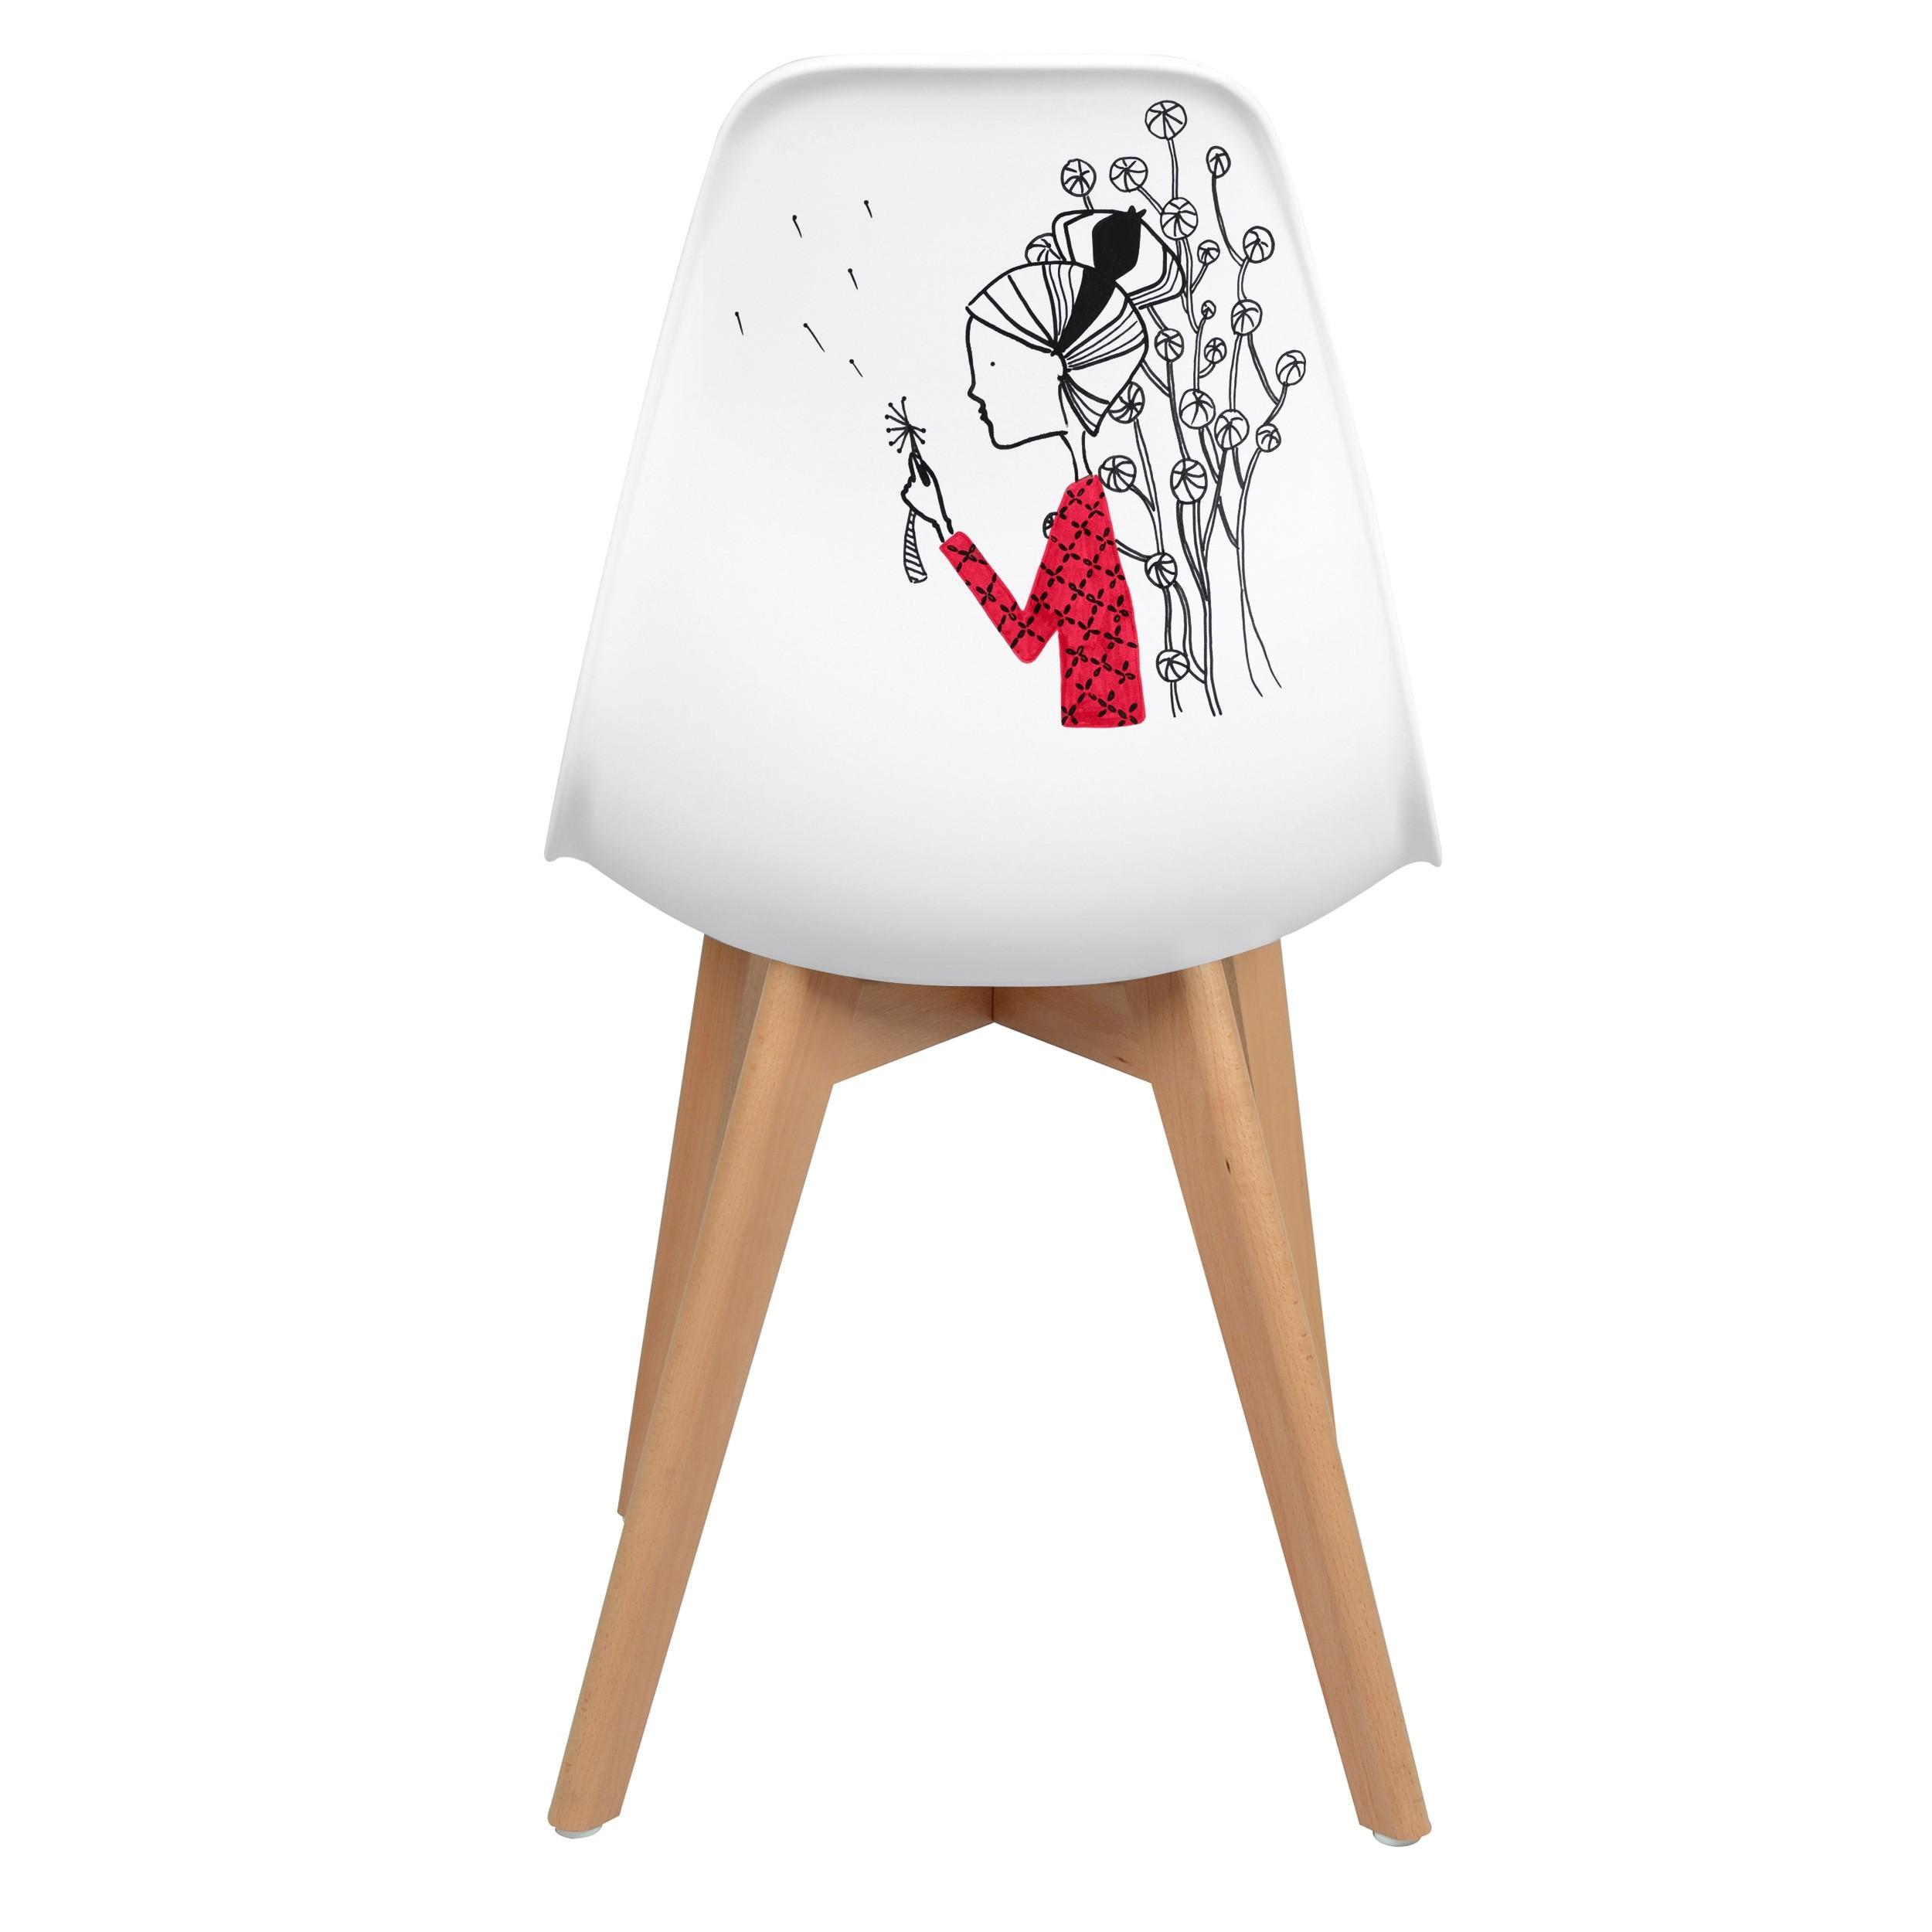 acheter chaise d artiste blanche scandinave